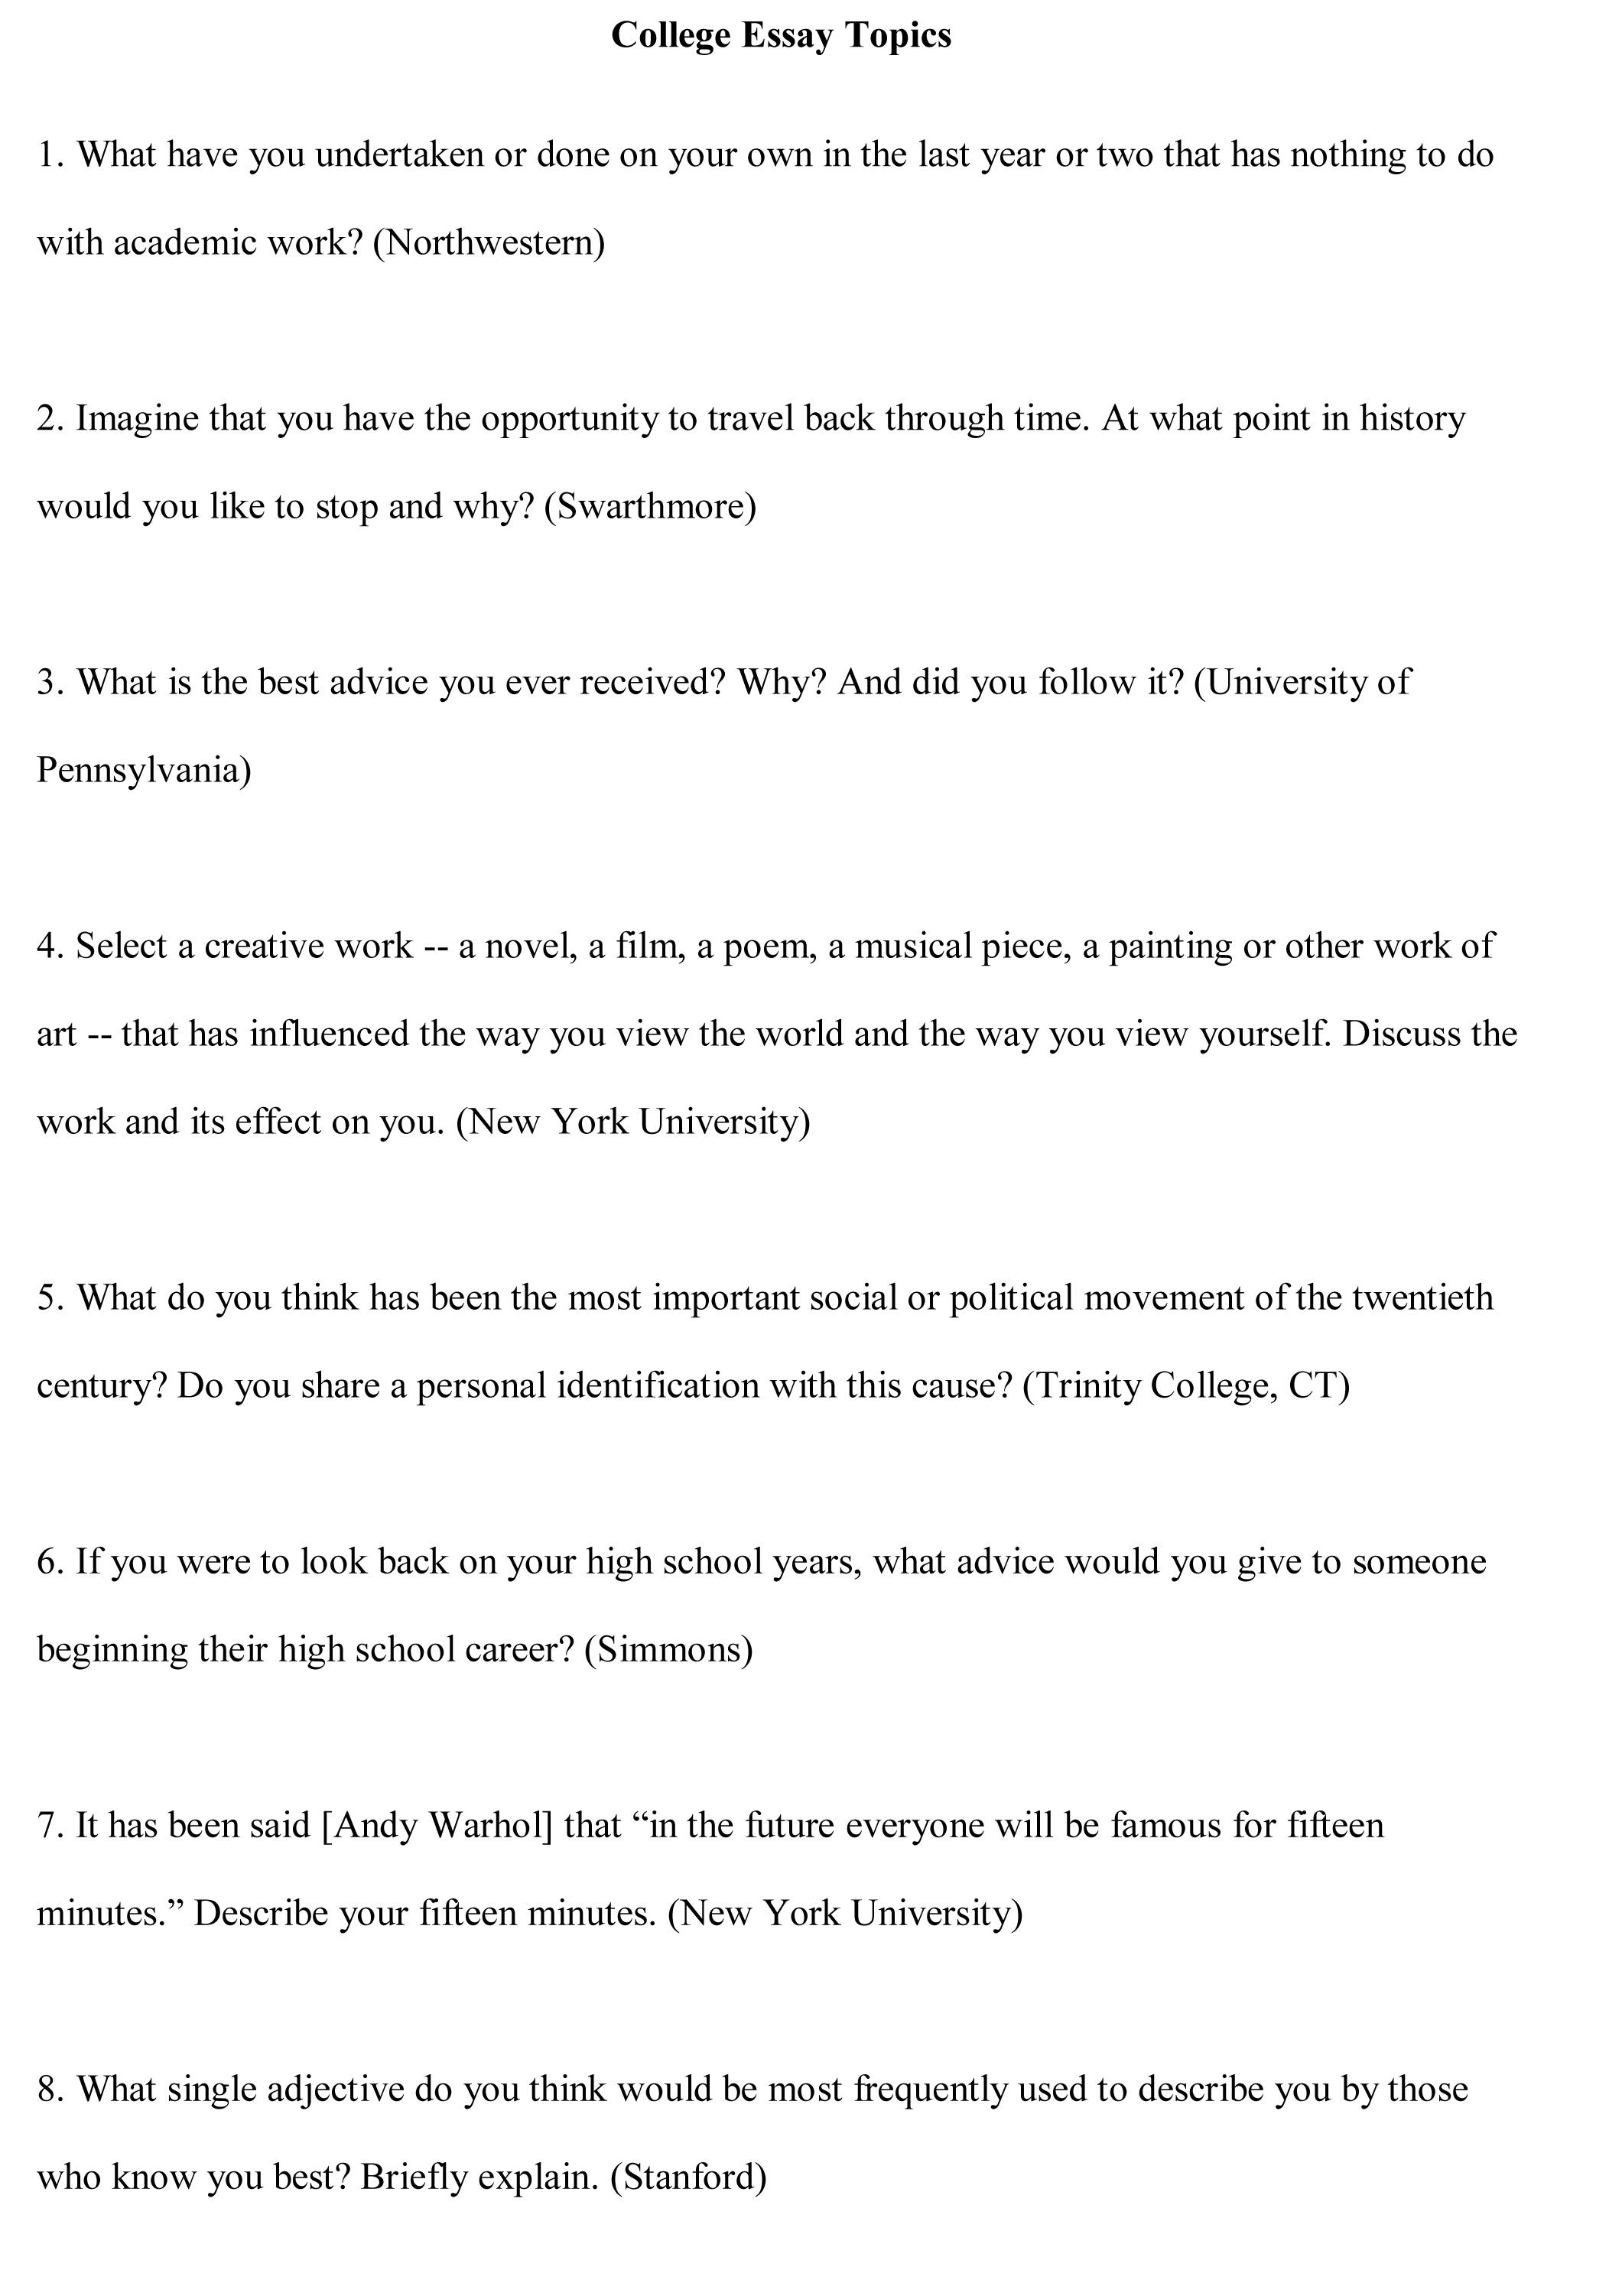 Sample Essay Topics For High School Students